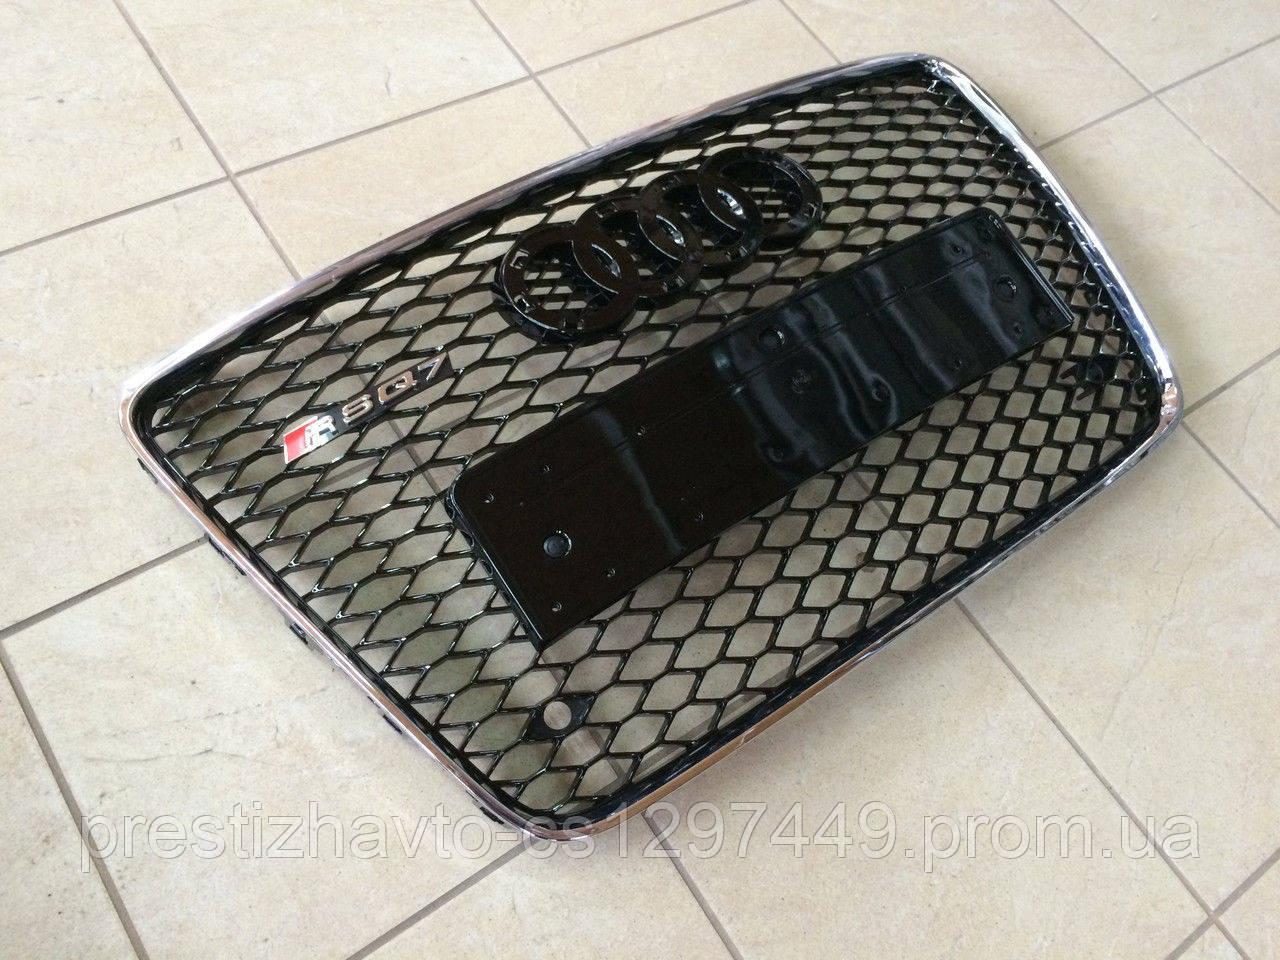 Решетка радиатора на Audi RSQ7 (2012г.)